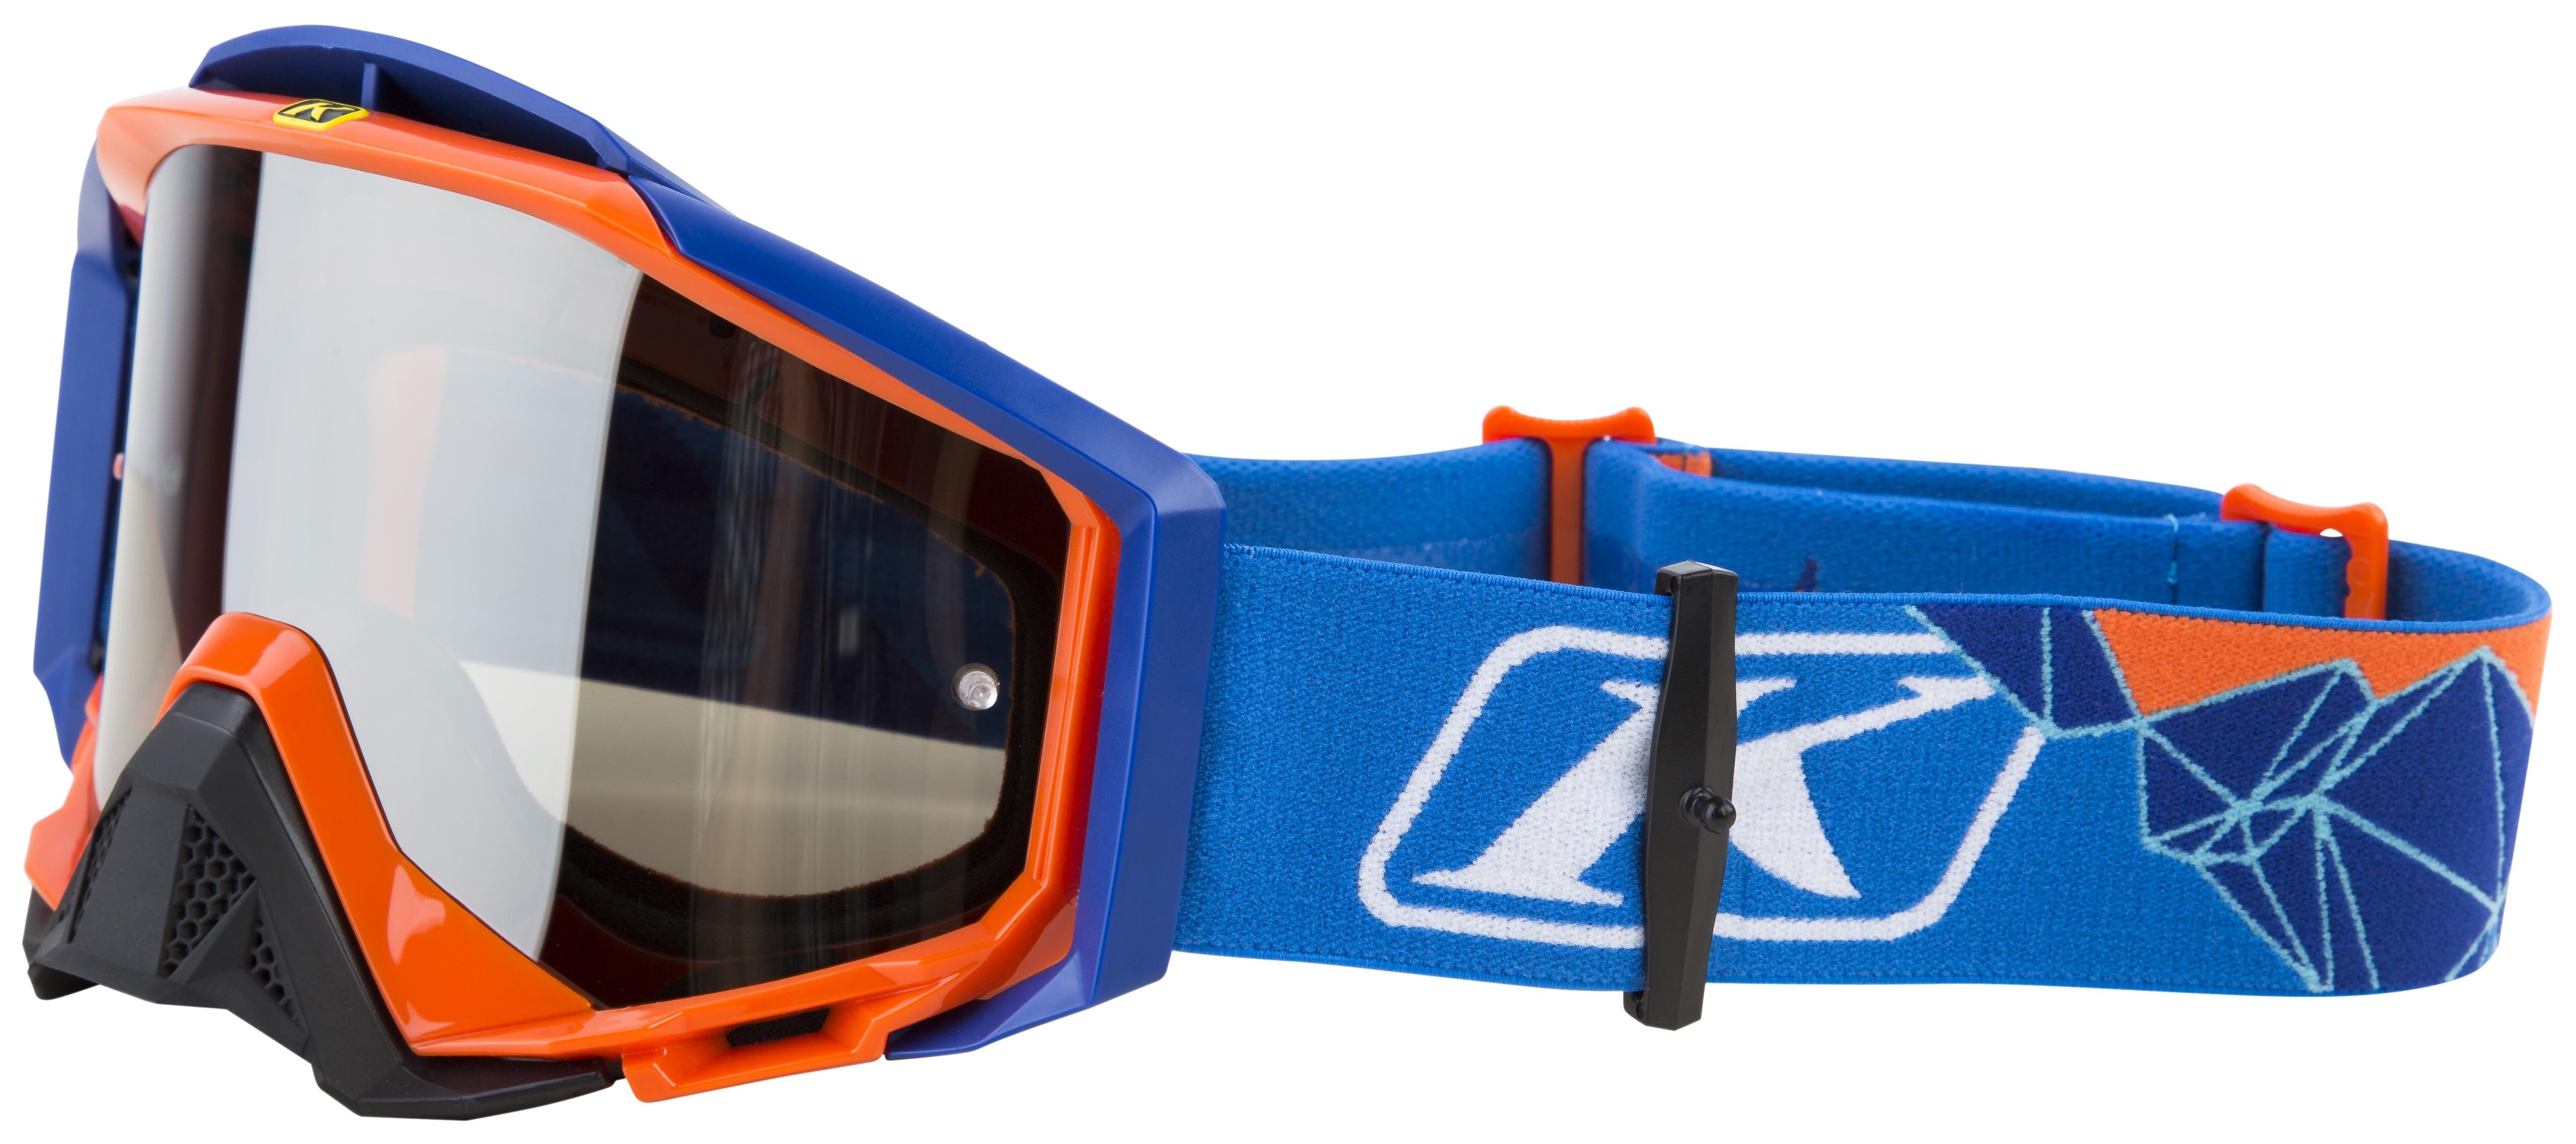 694d8d29409e Klim Radius Pro Snow Goggles - RevZilla